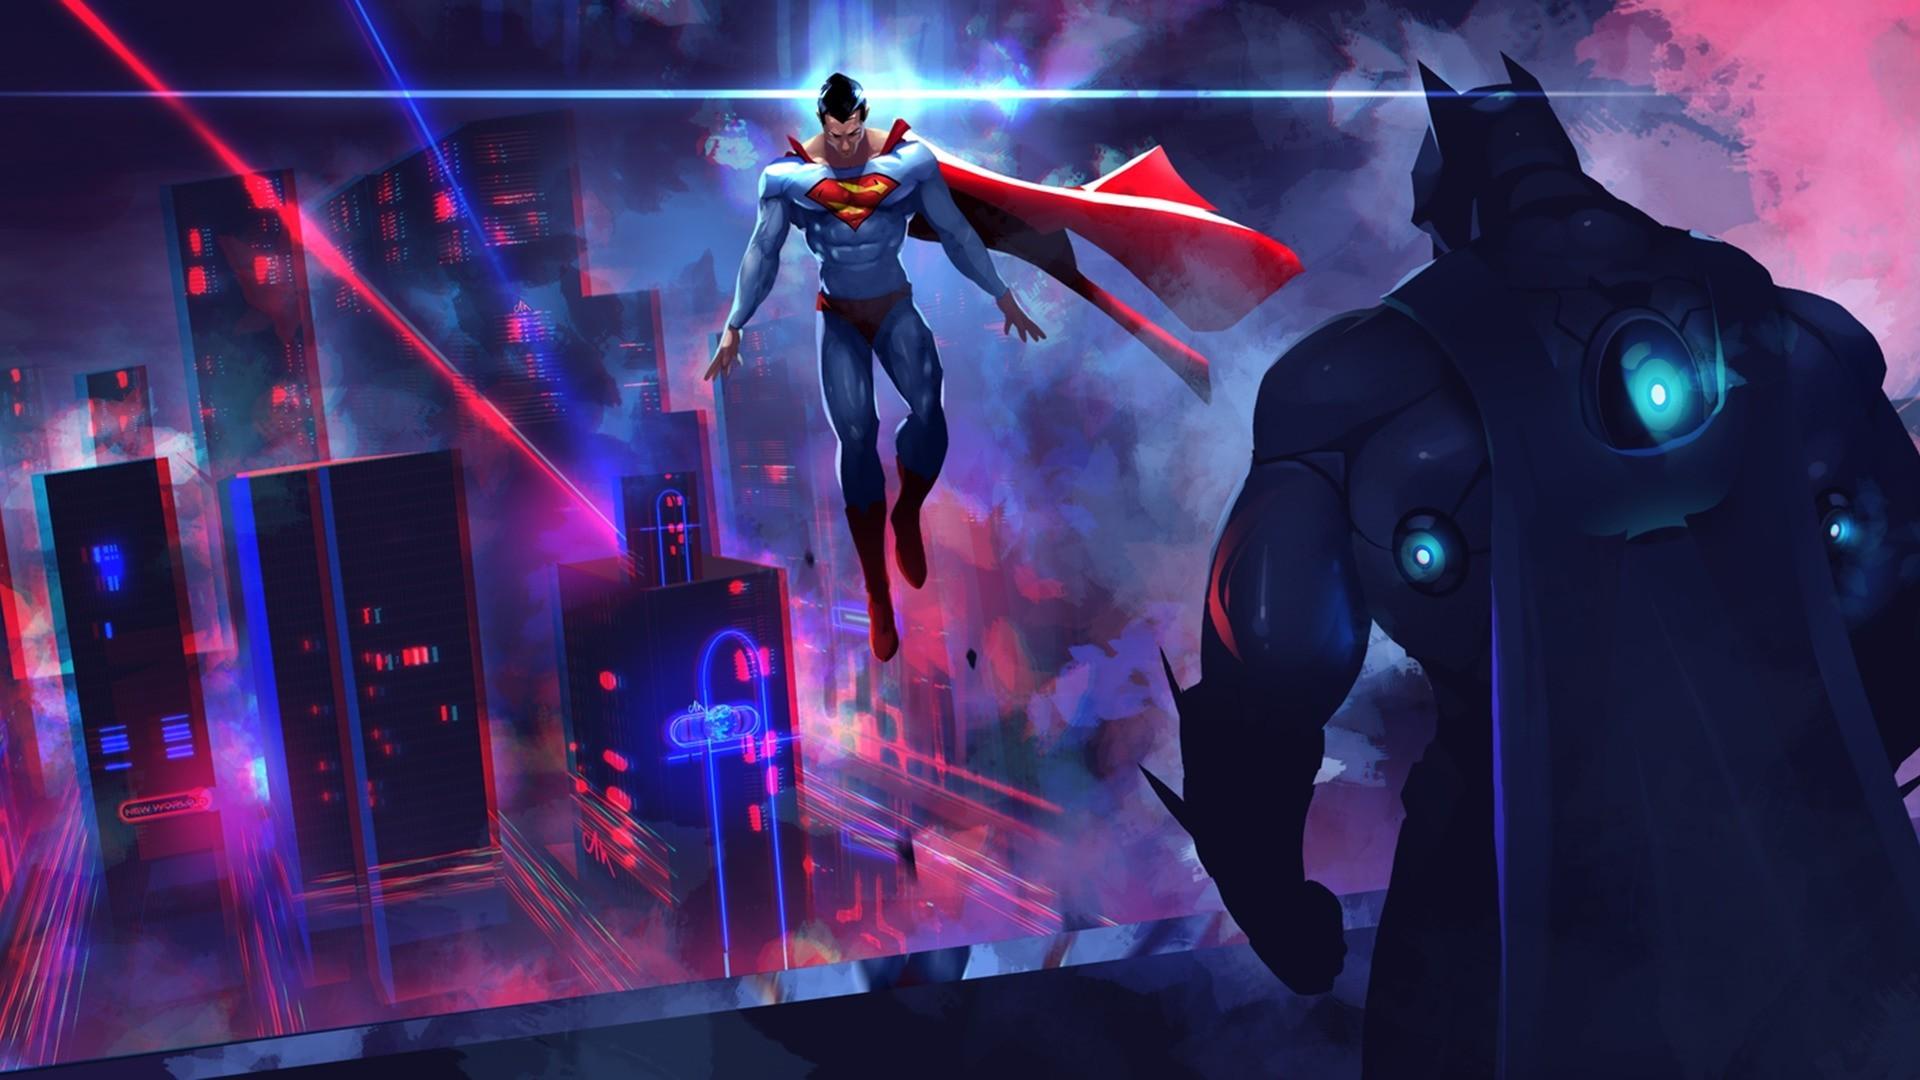 Neon Artwork Batman DC Comics Superman Performance Stage Screenshot Musical Theatre Art